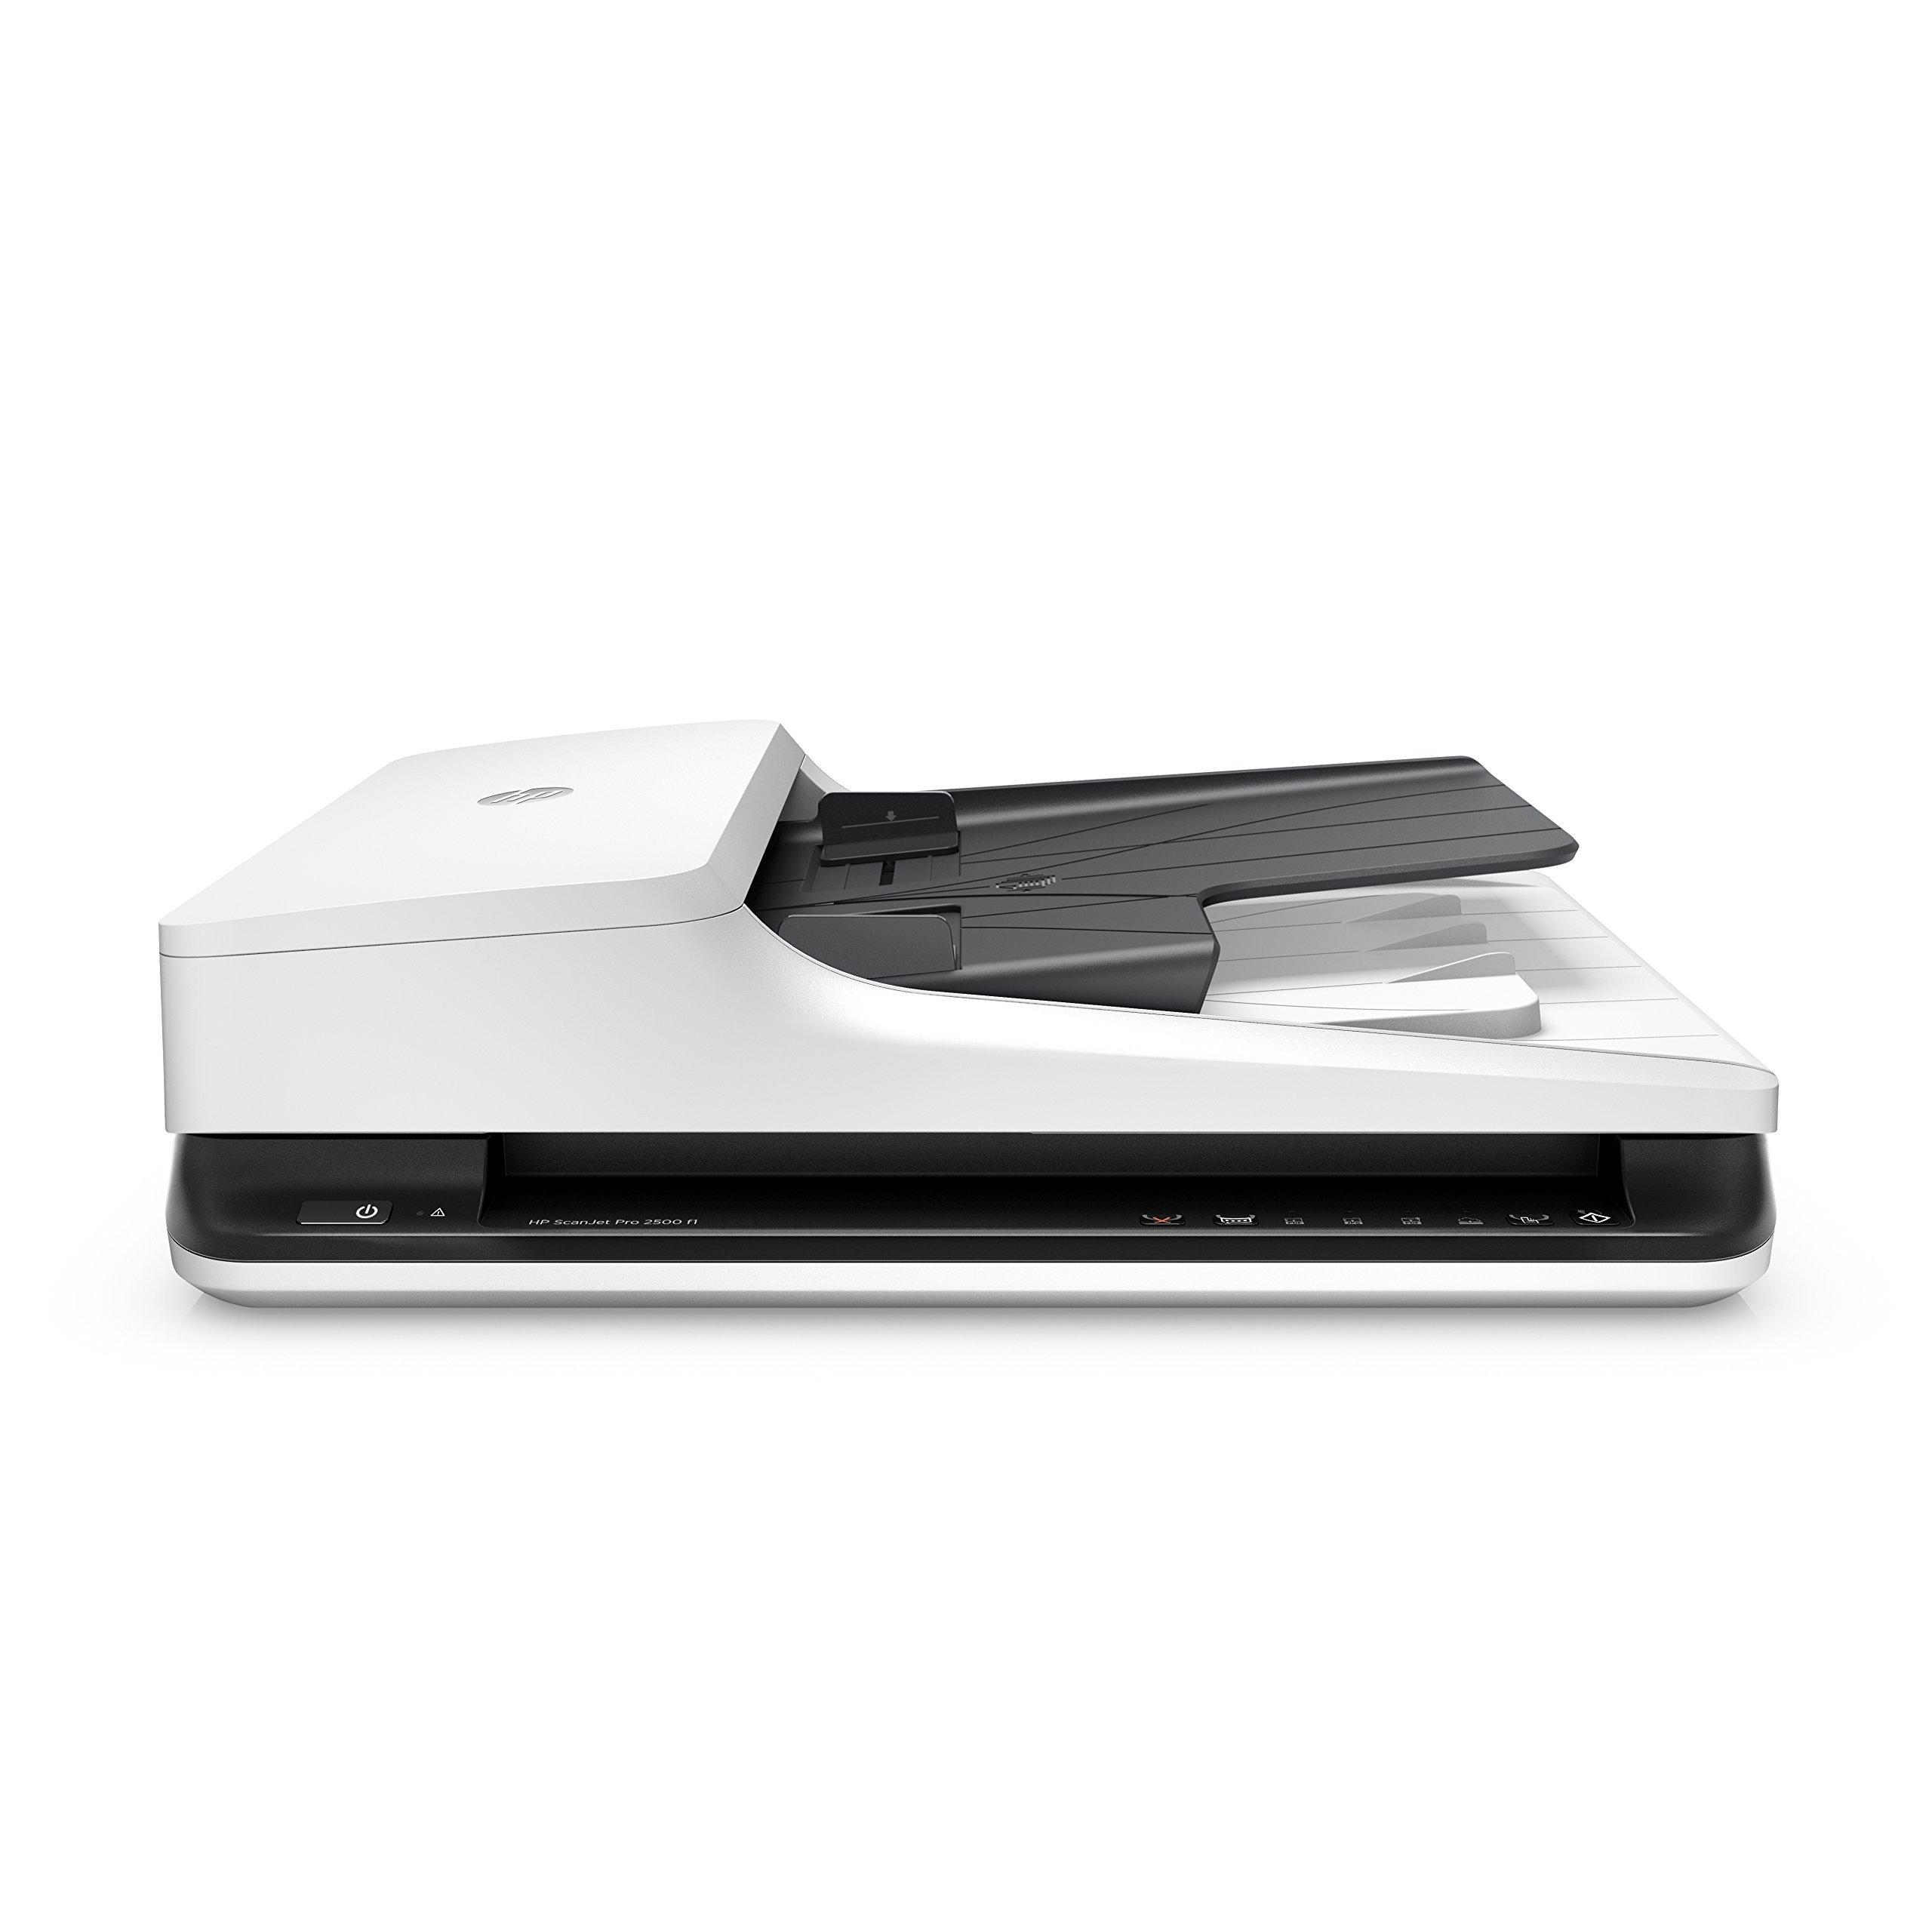 HP ScanJet Pro 2500 f1 Flatbed OCR Scanner (Renewed) by HP